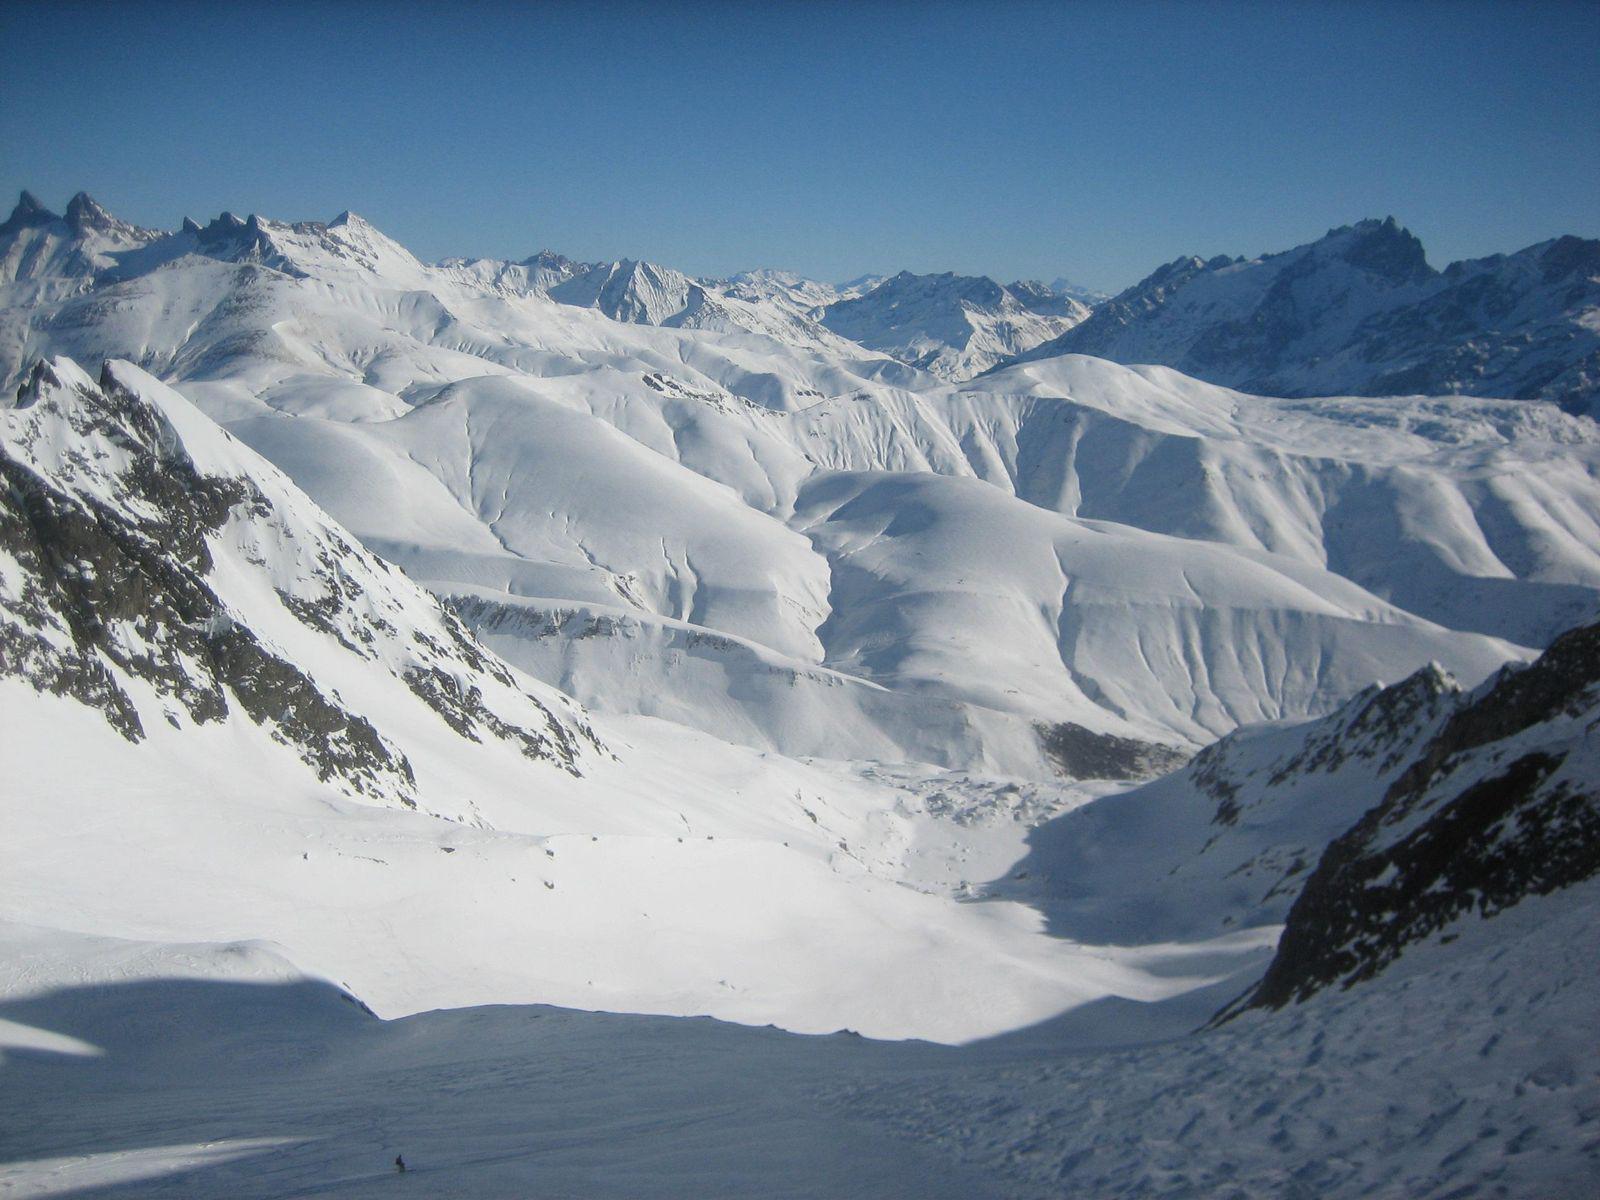 Station de ski du Grave la Meije_La Grave (1)